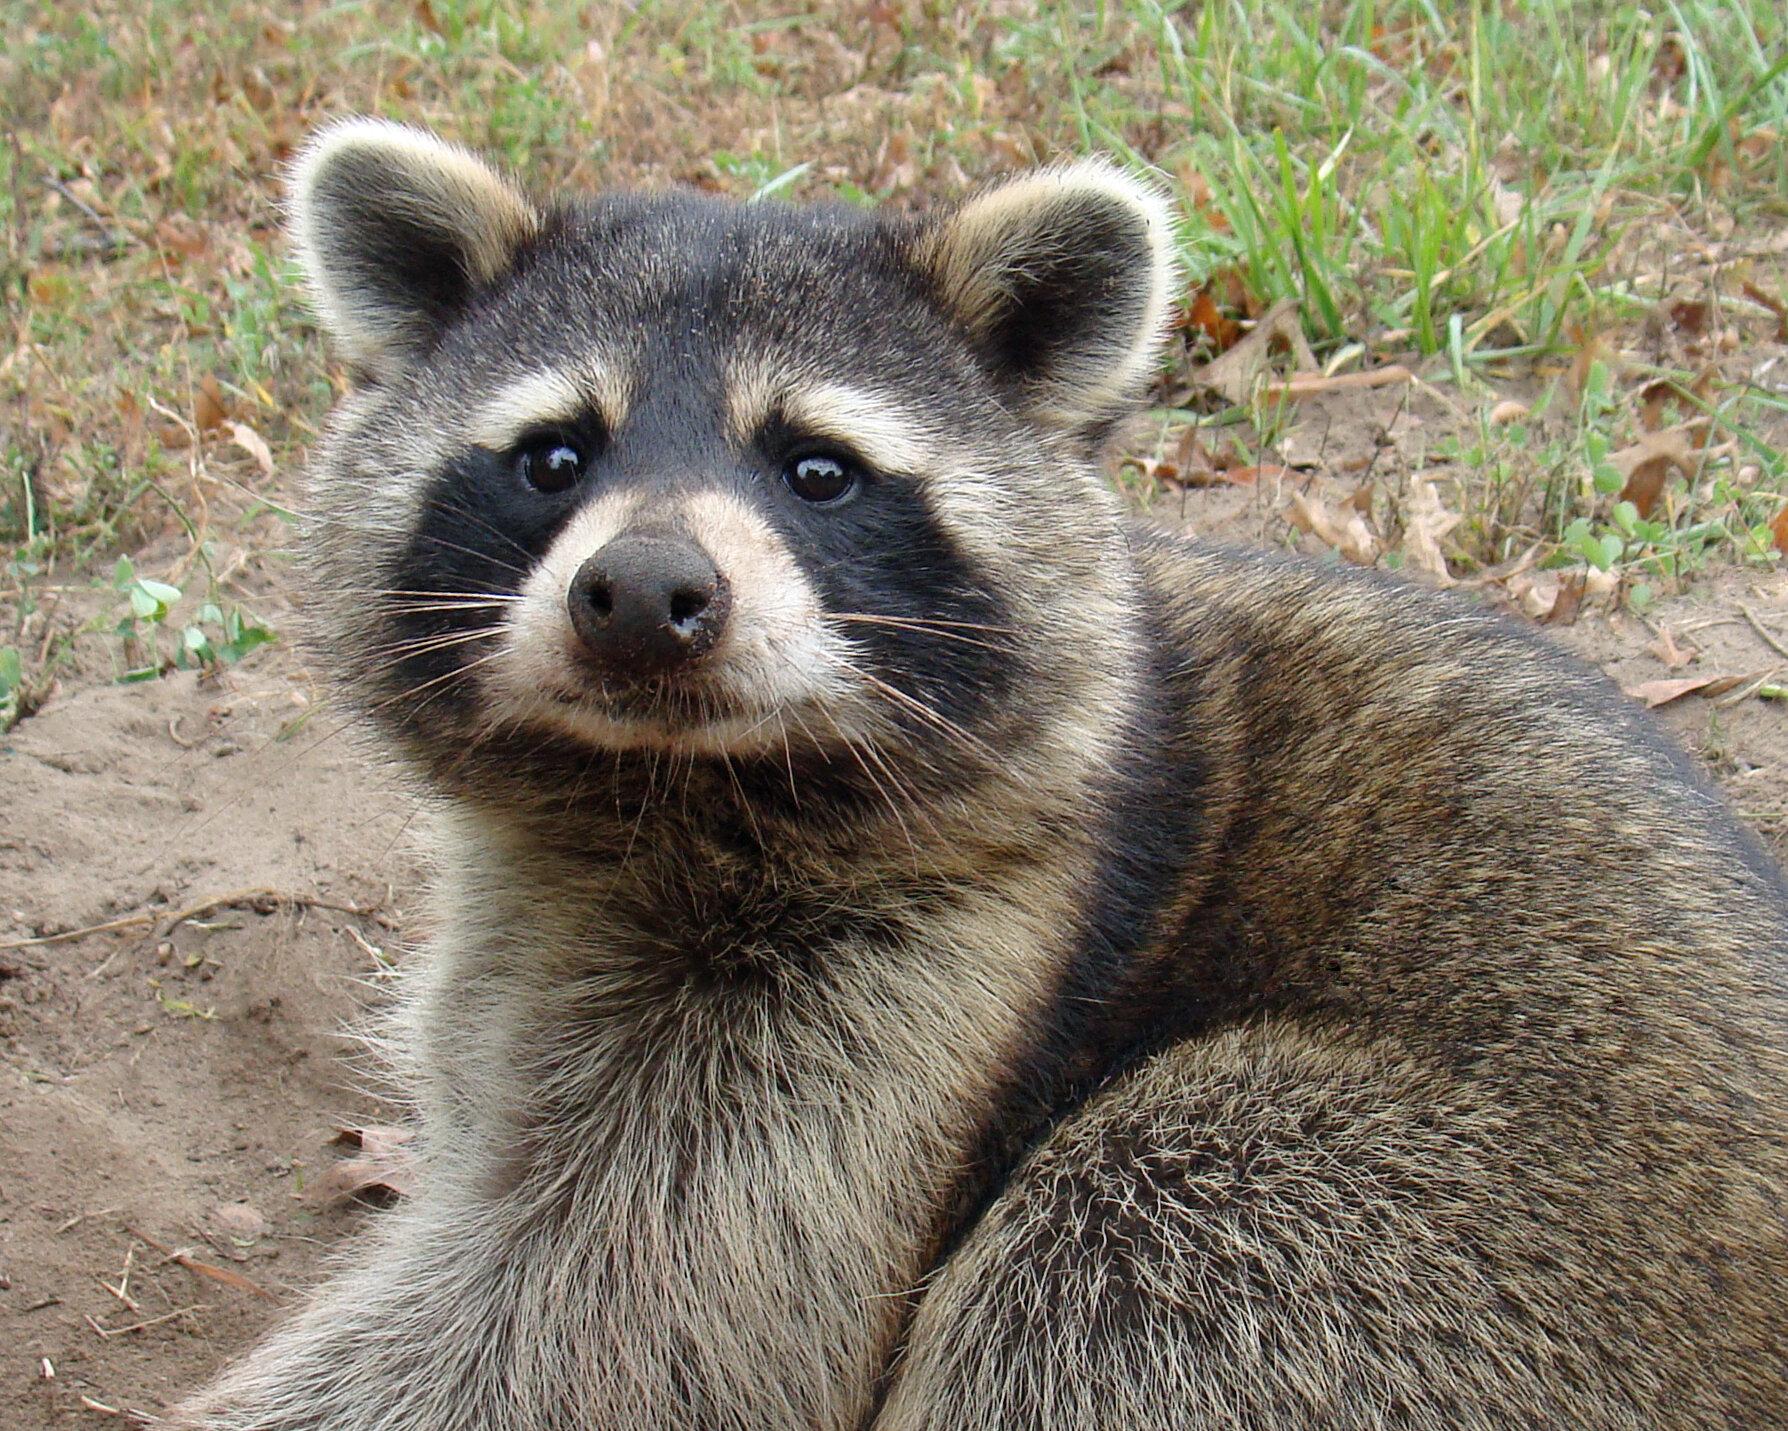 Wildlife Watching Wednesday: Raccoons, The Masked Bandits